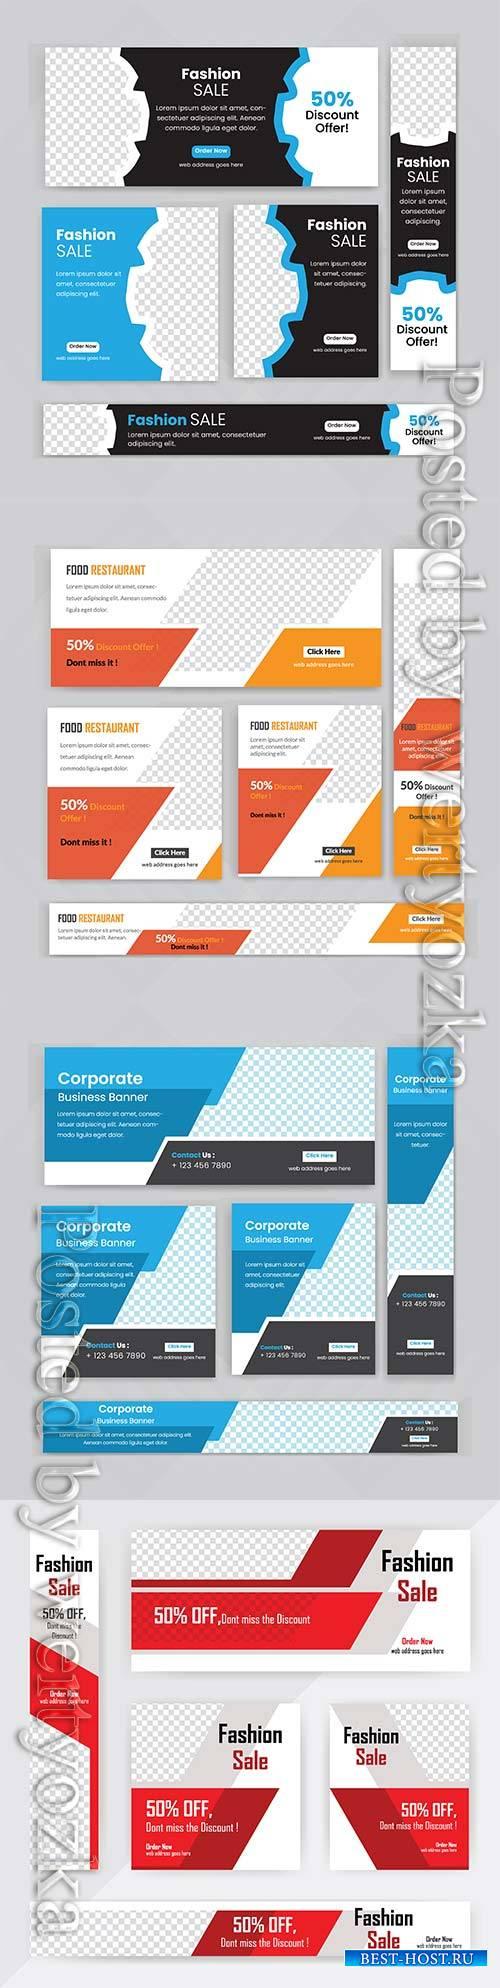 Web banner vector set design, business concept